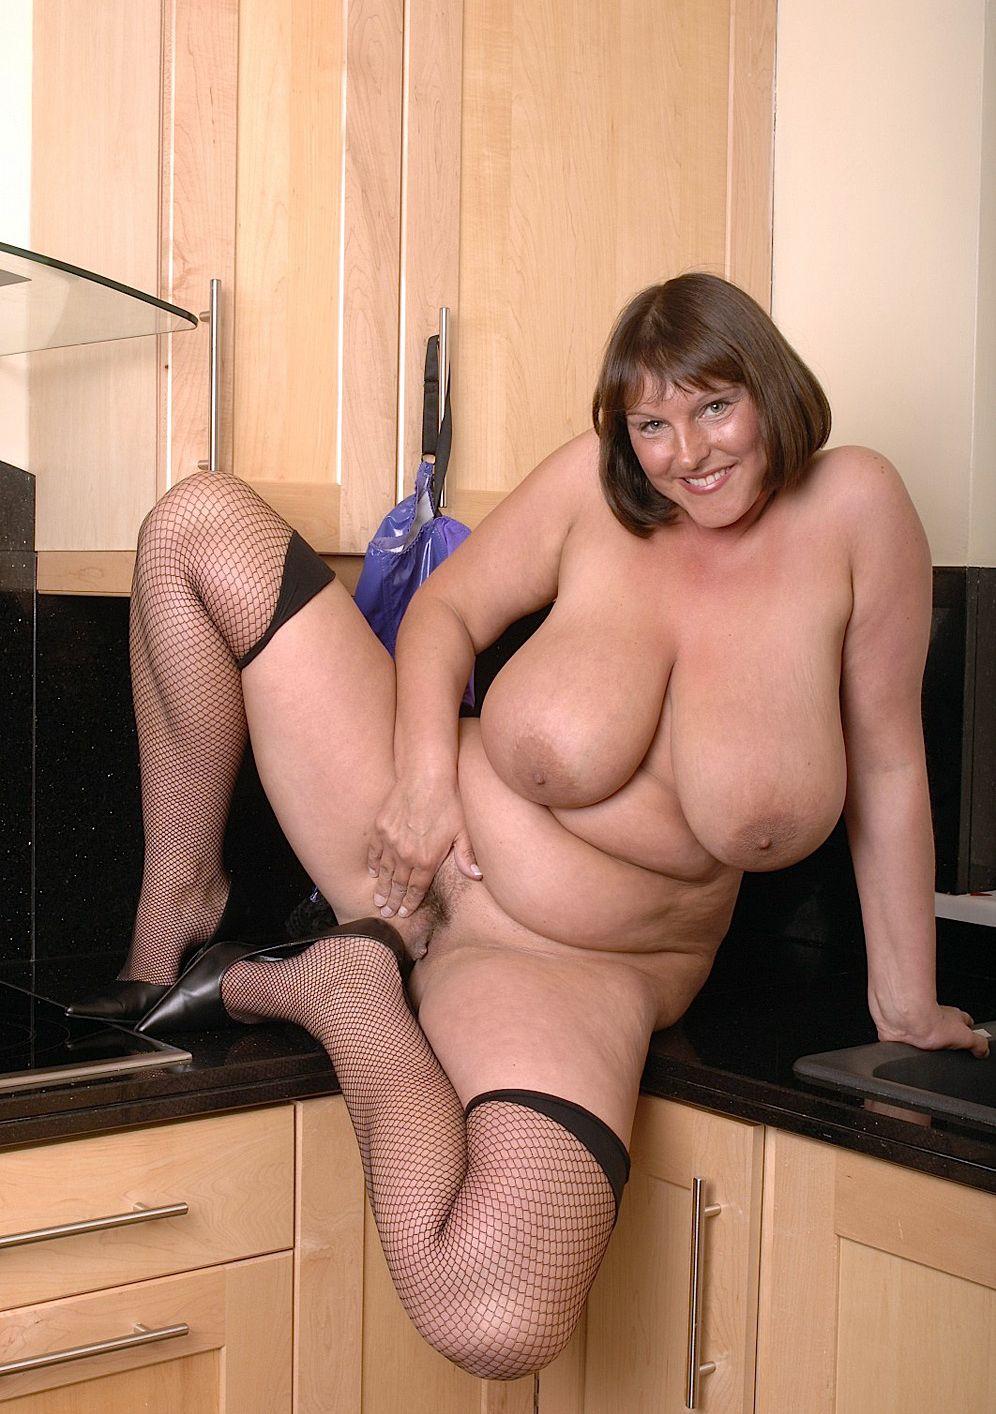 vieille gros seins grosses fesses